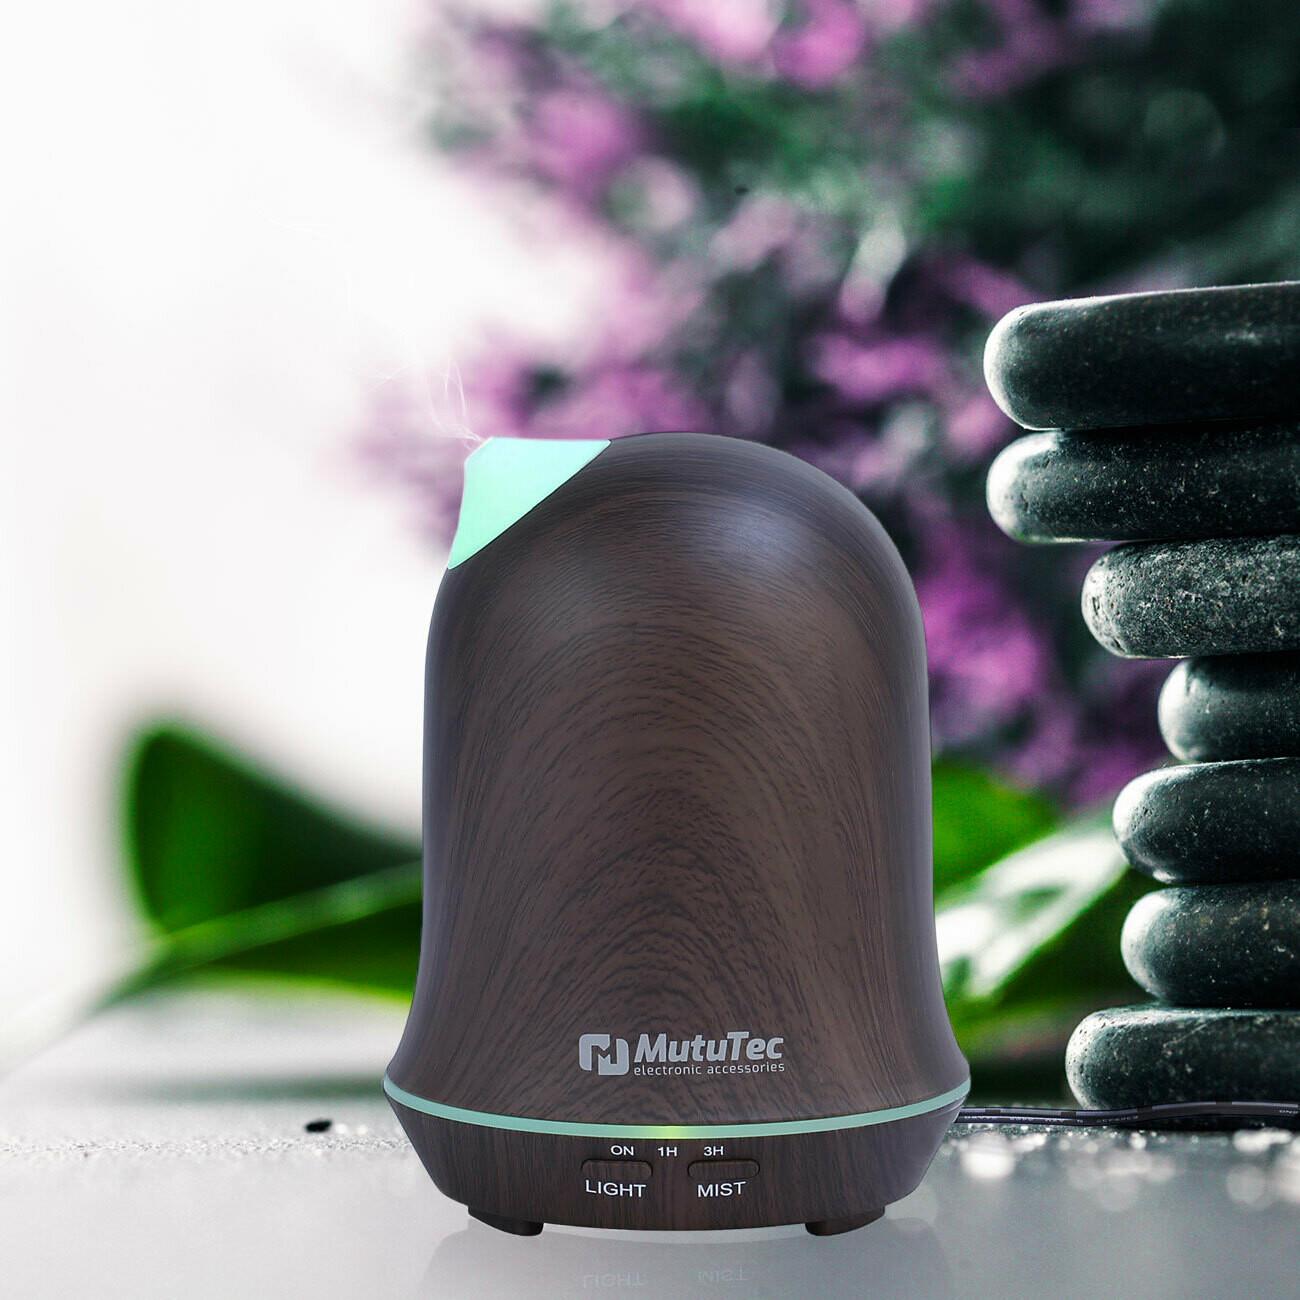 MutuTec Luftbefeuchter / Aroma Diffuser mit verstellbarer Düse - 200 ml